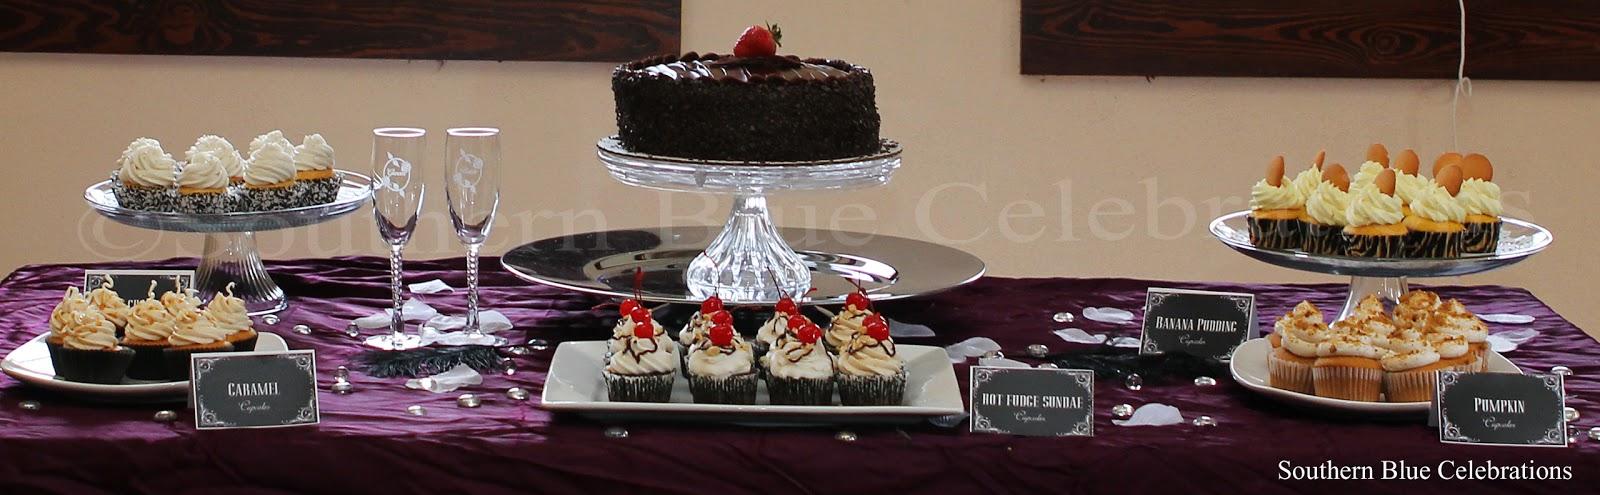 Southern Blue Celebrations: Black, White & Purple Wedding Reception